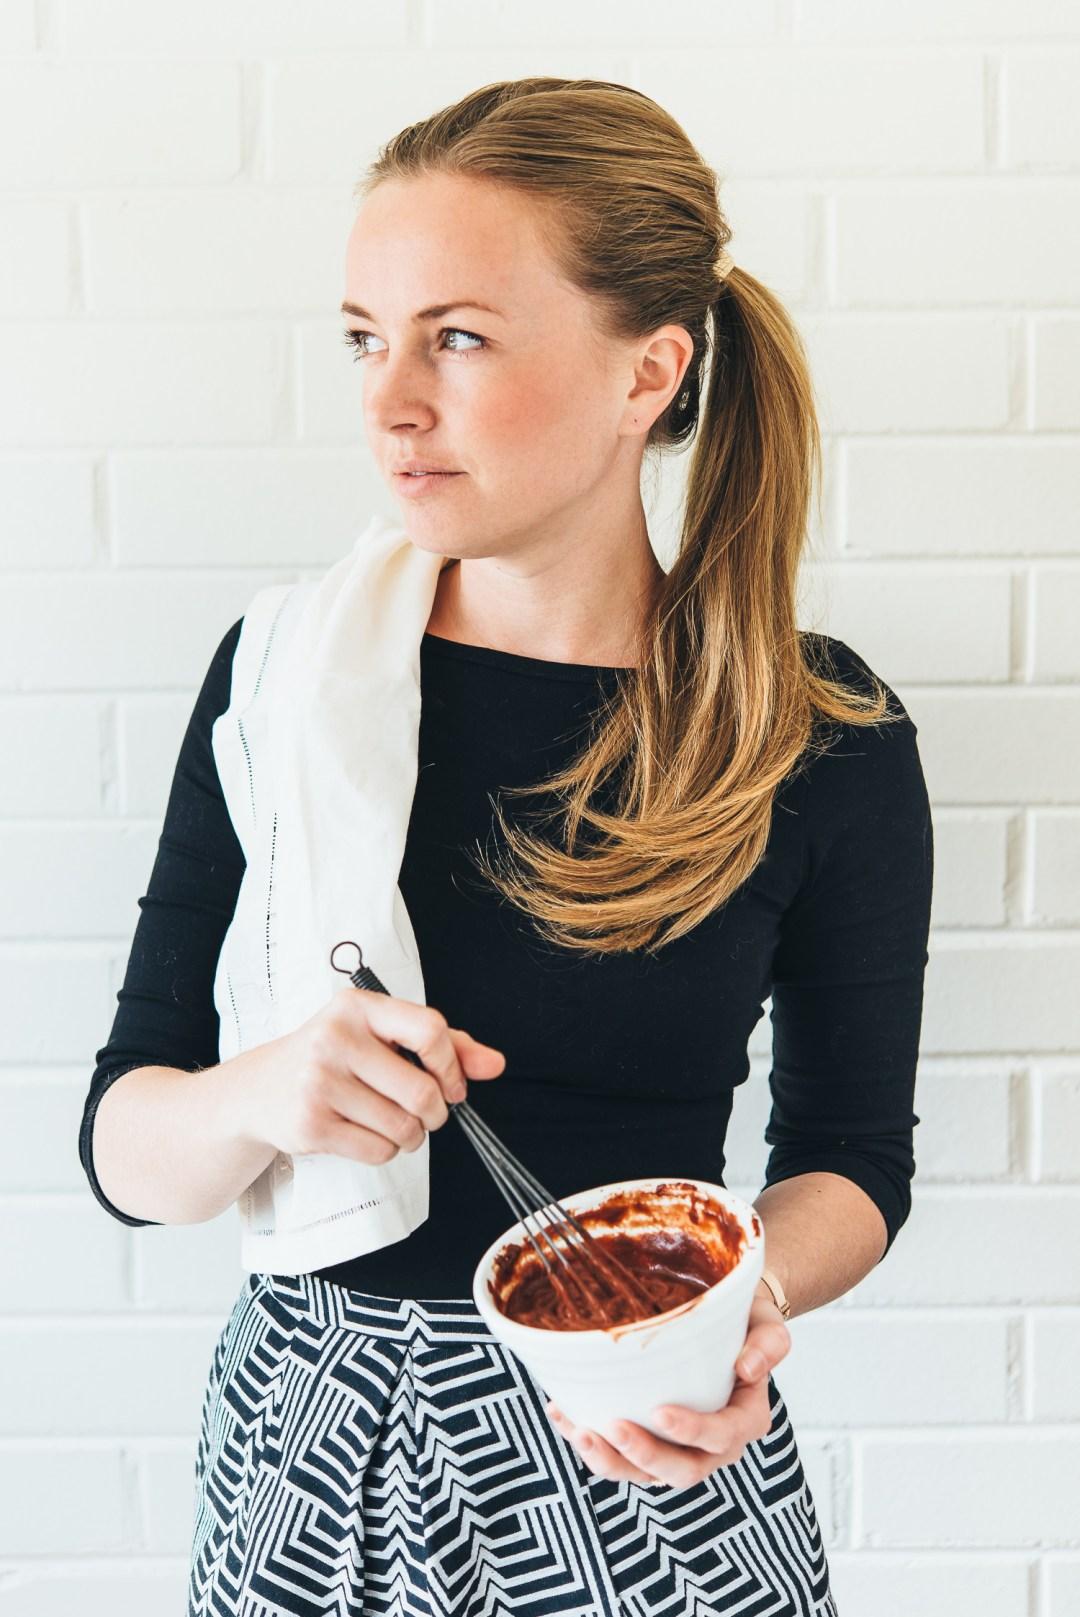 Rachel Jane, food photographer